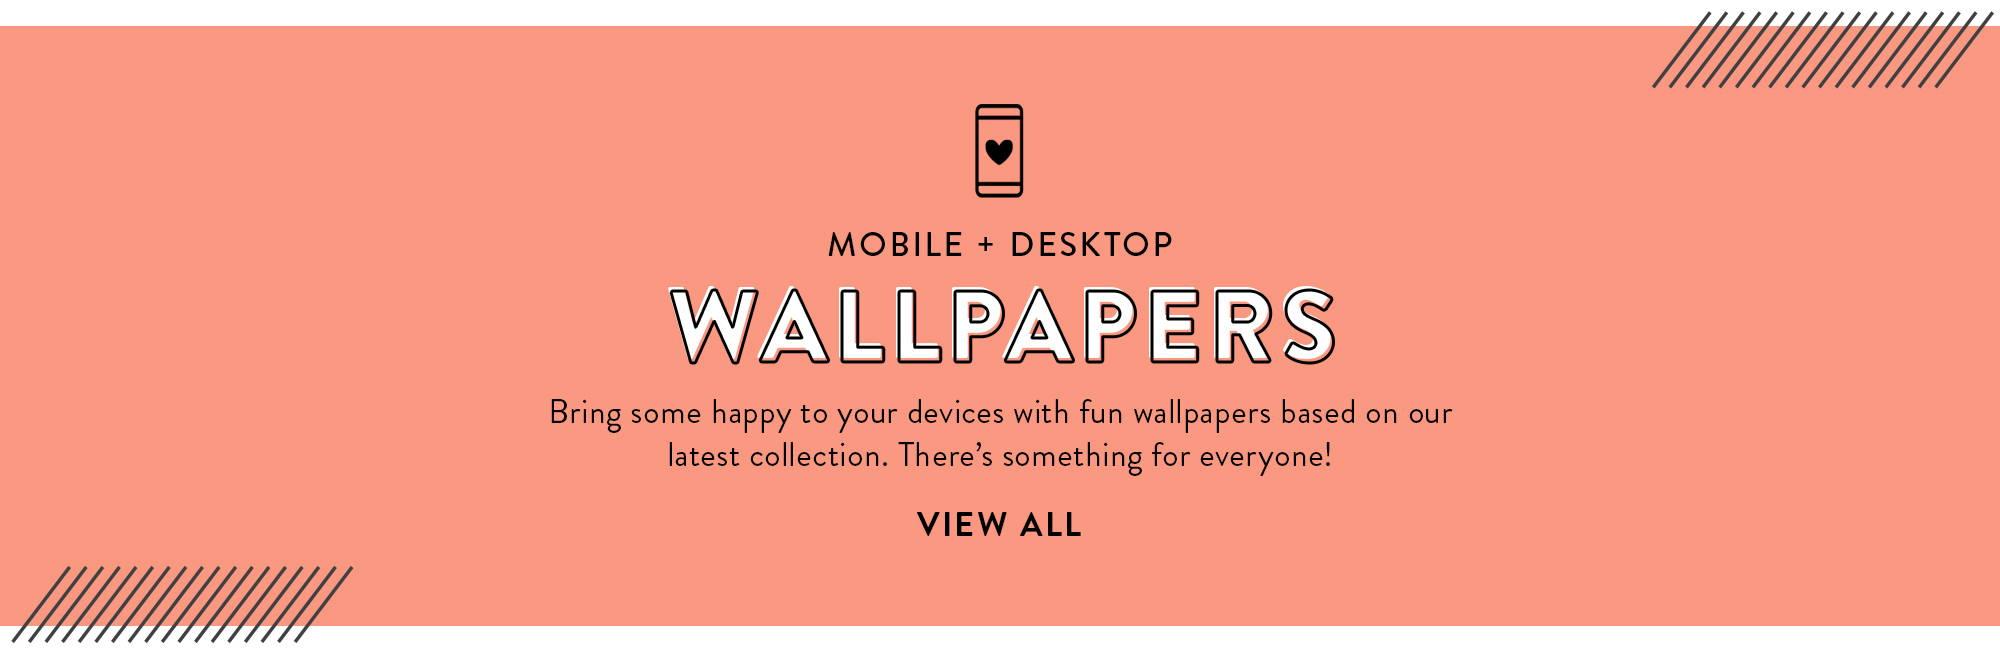 Mobile + Desktop Wallpaper Downloads